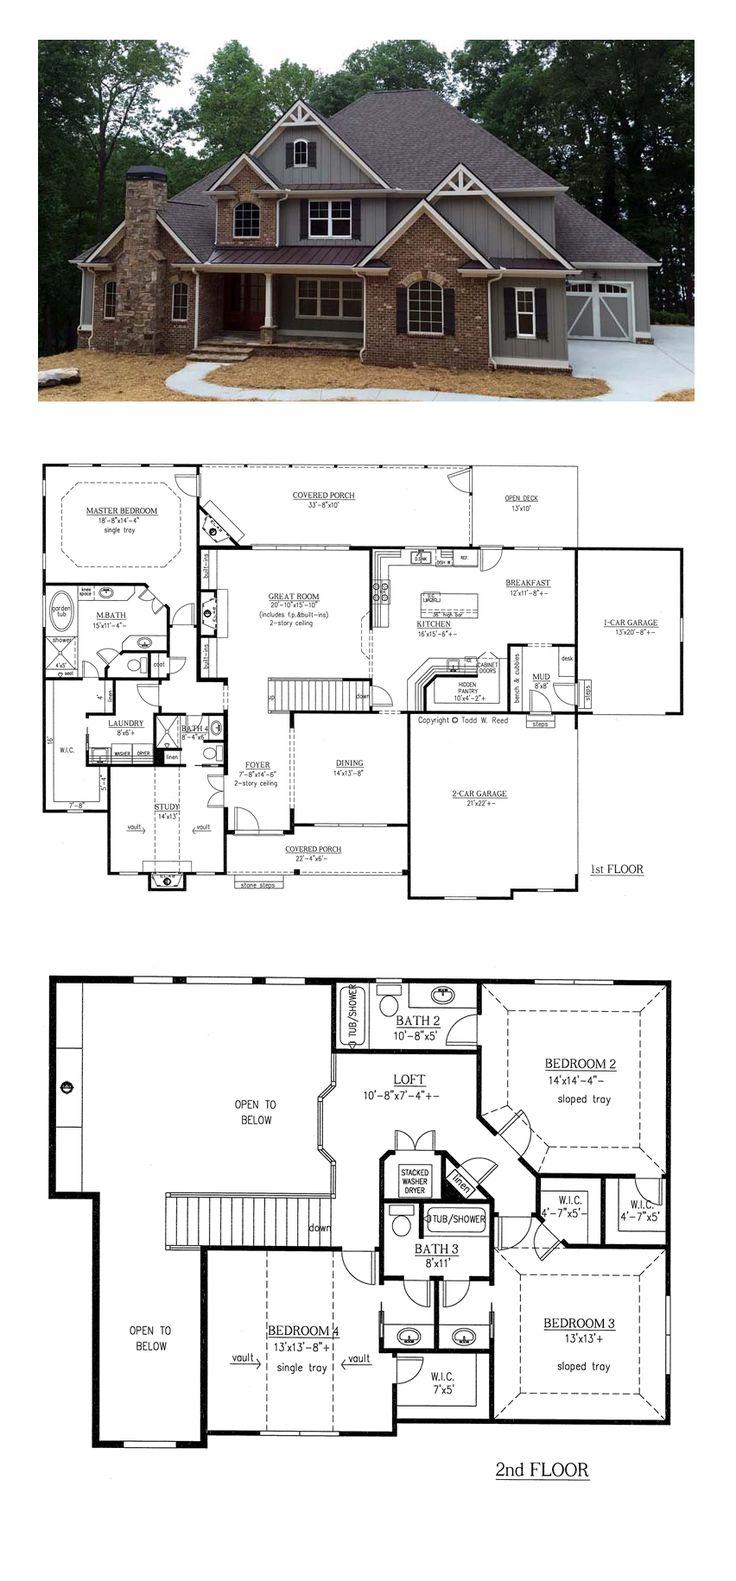 Tremendous 17 Best Ideas About House Plans On Pinterest Country House Plans Largest Home Design Picture Inspirations Pitcheantrous